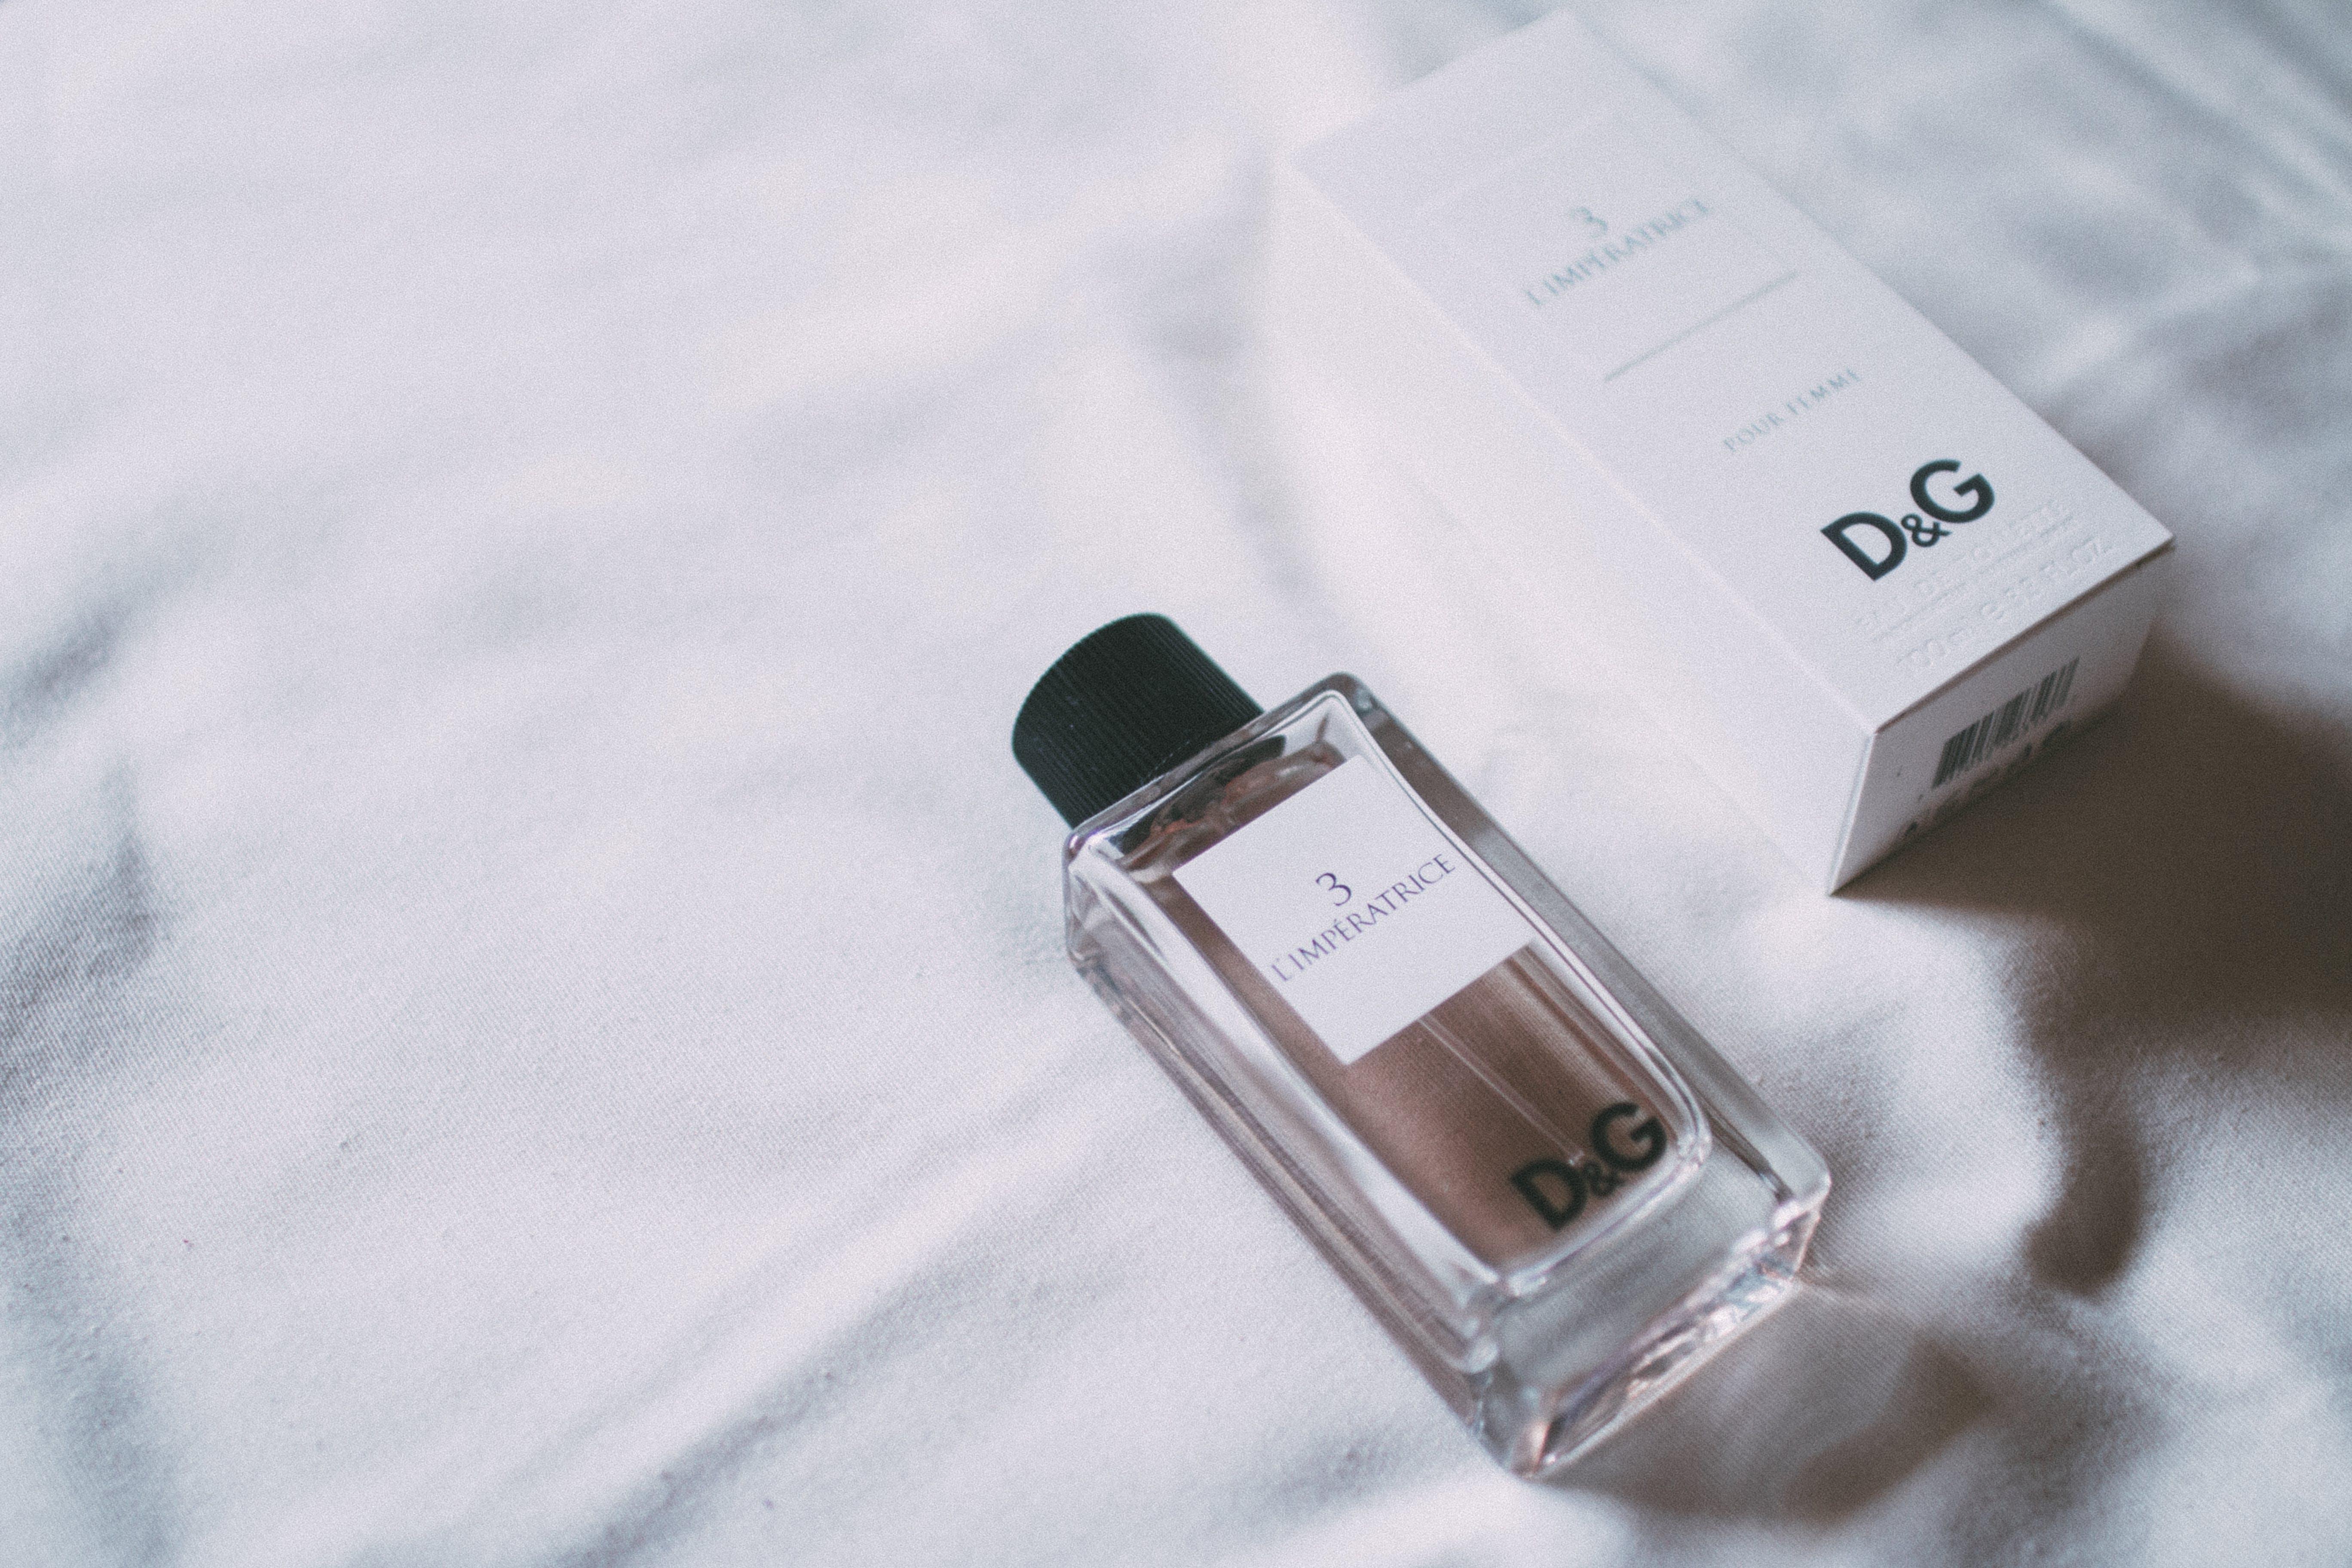 zu box, container, duft, duftend